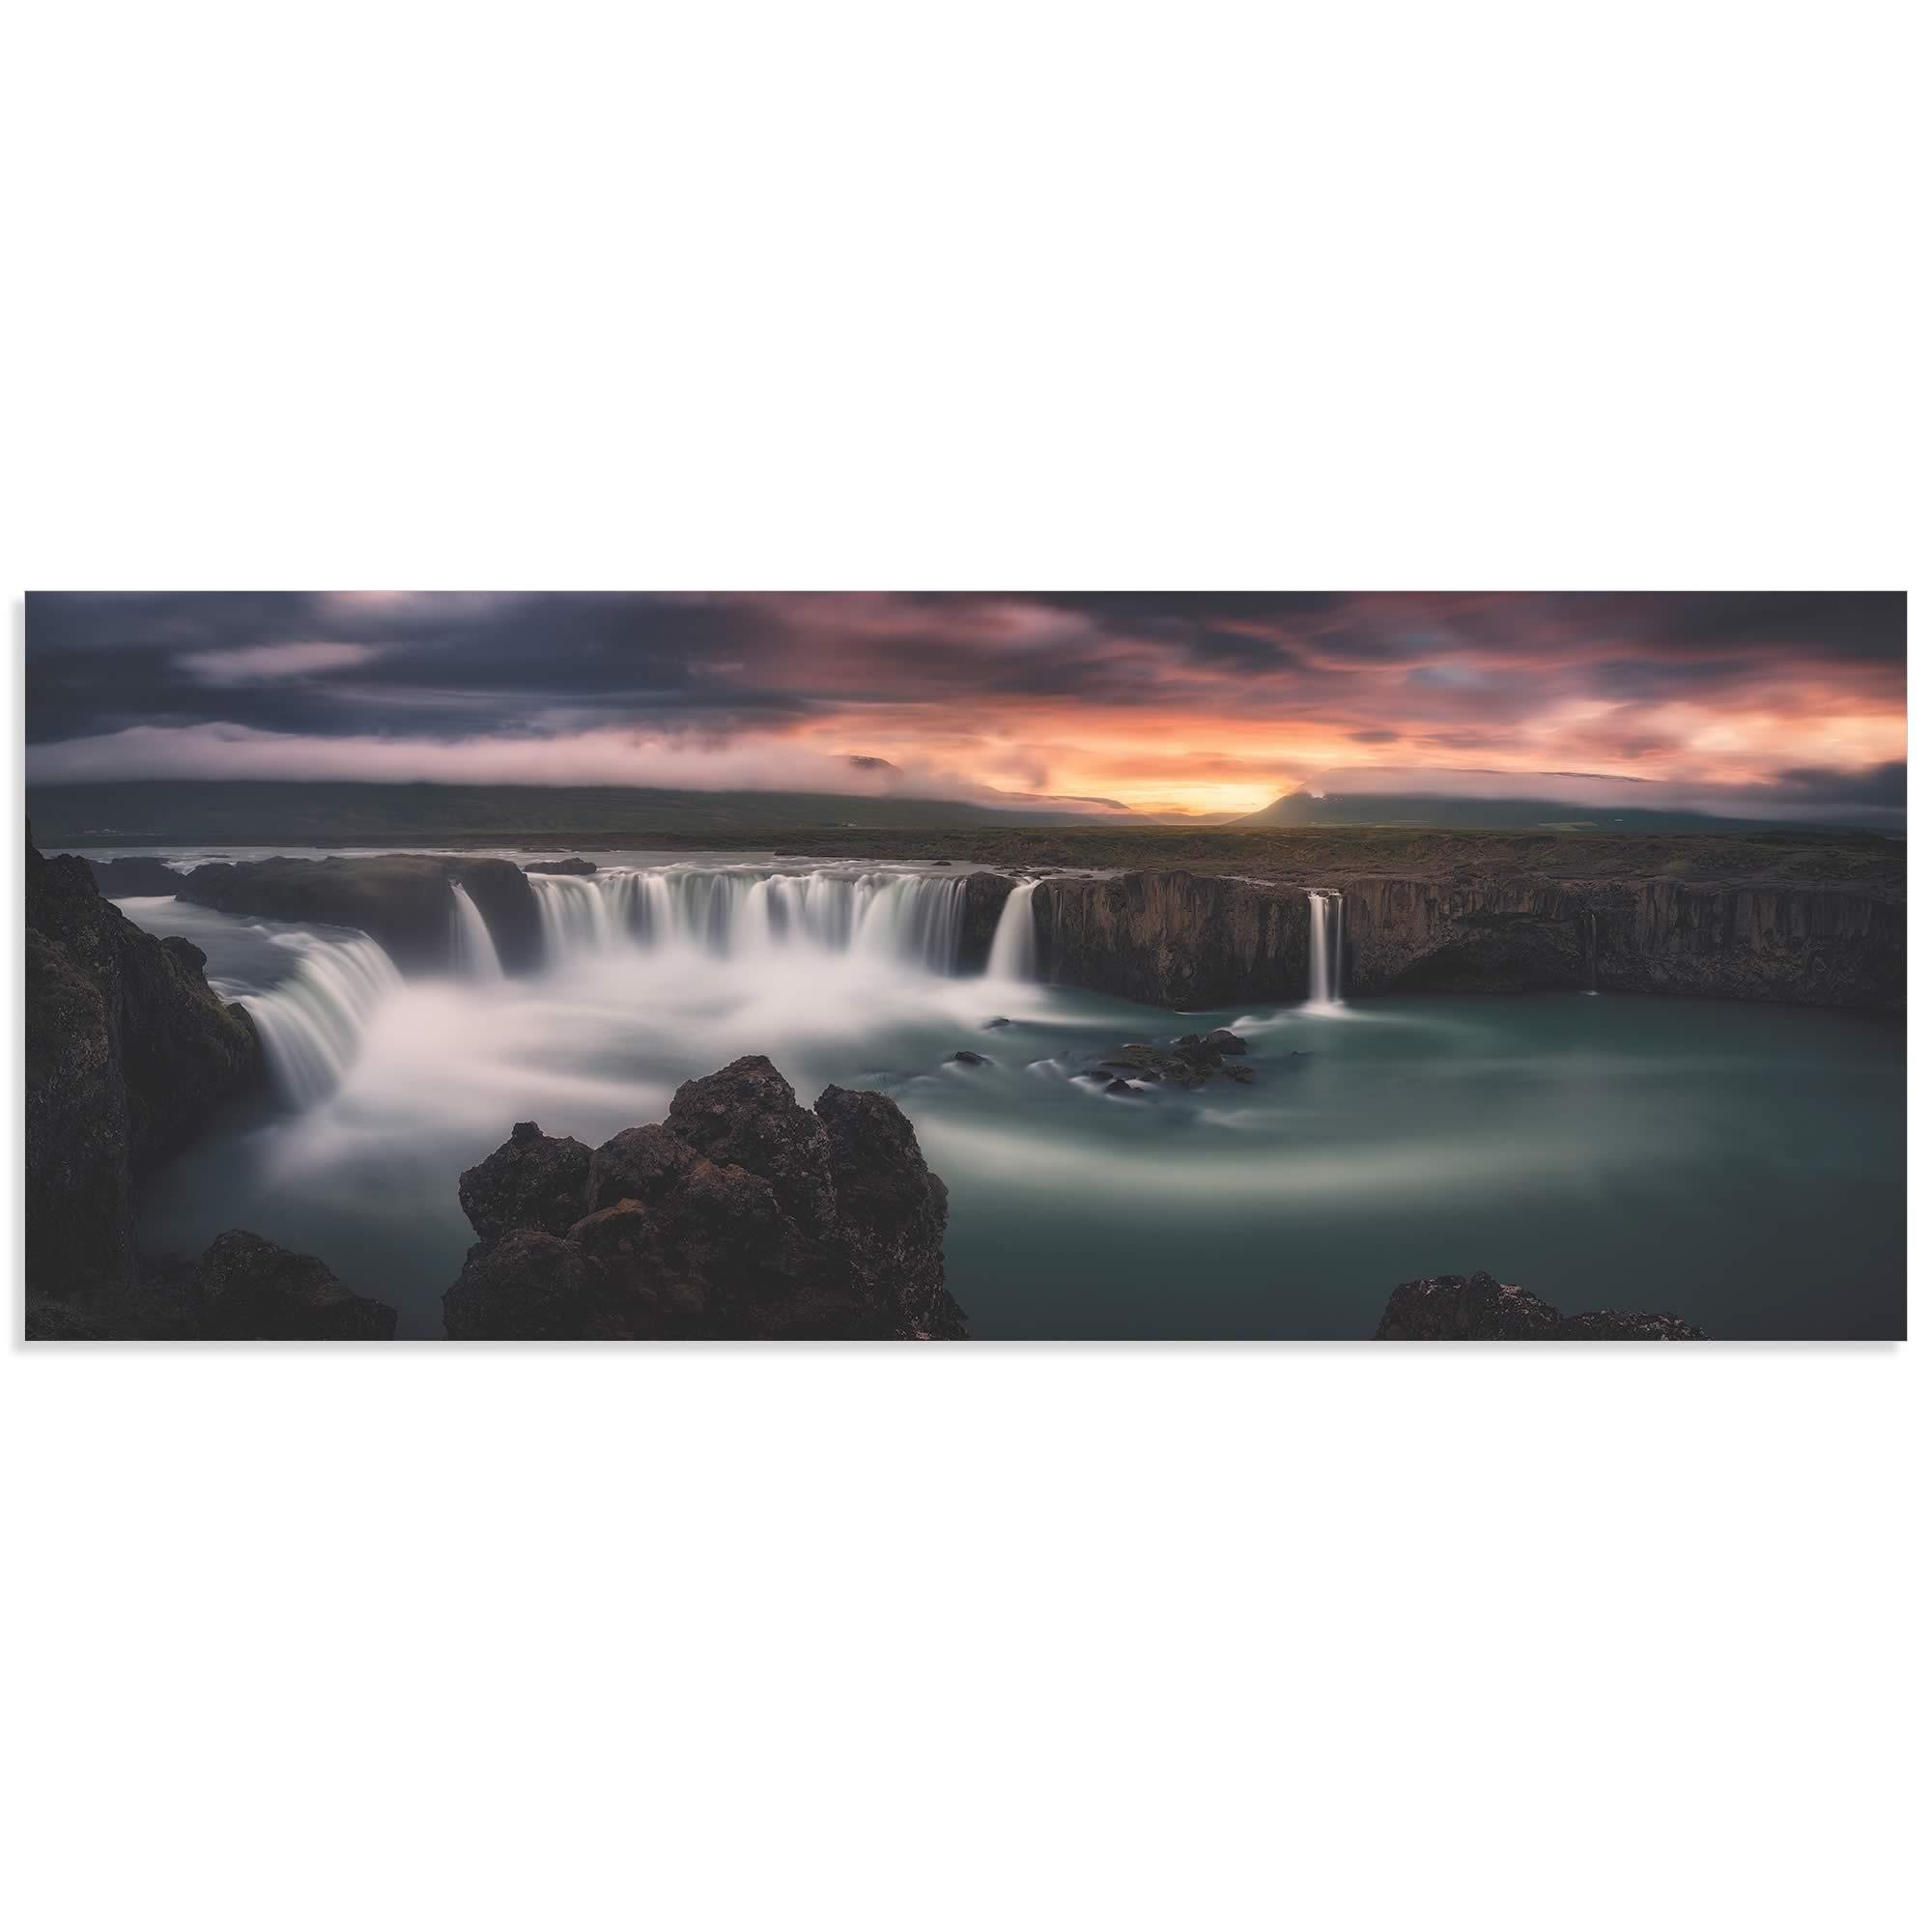 Fire and Waterfalls by Stefan Mitterwallner - Waterfall Image on Metal or Acrylic